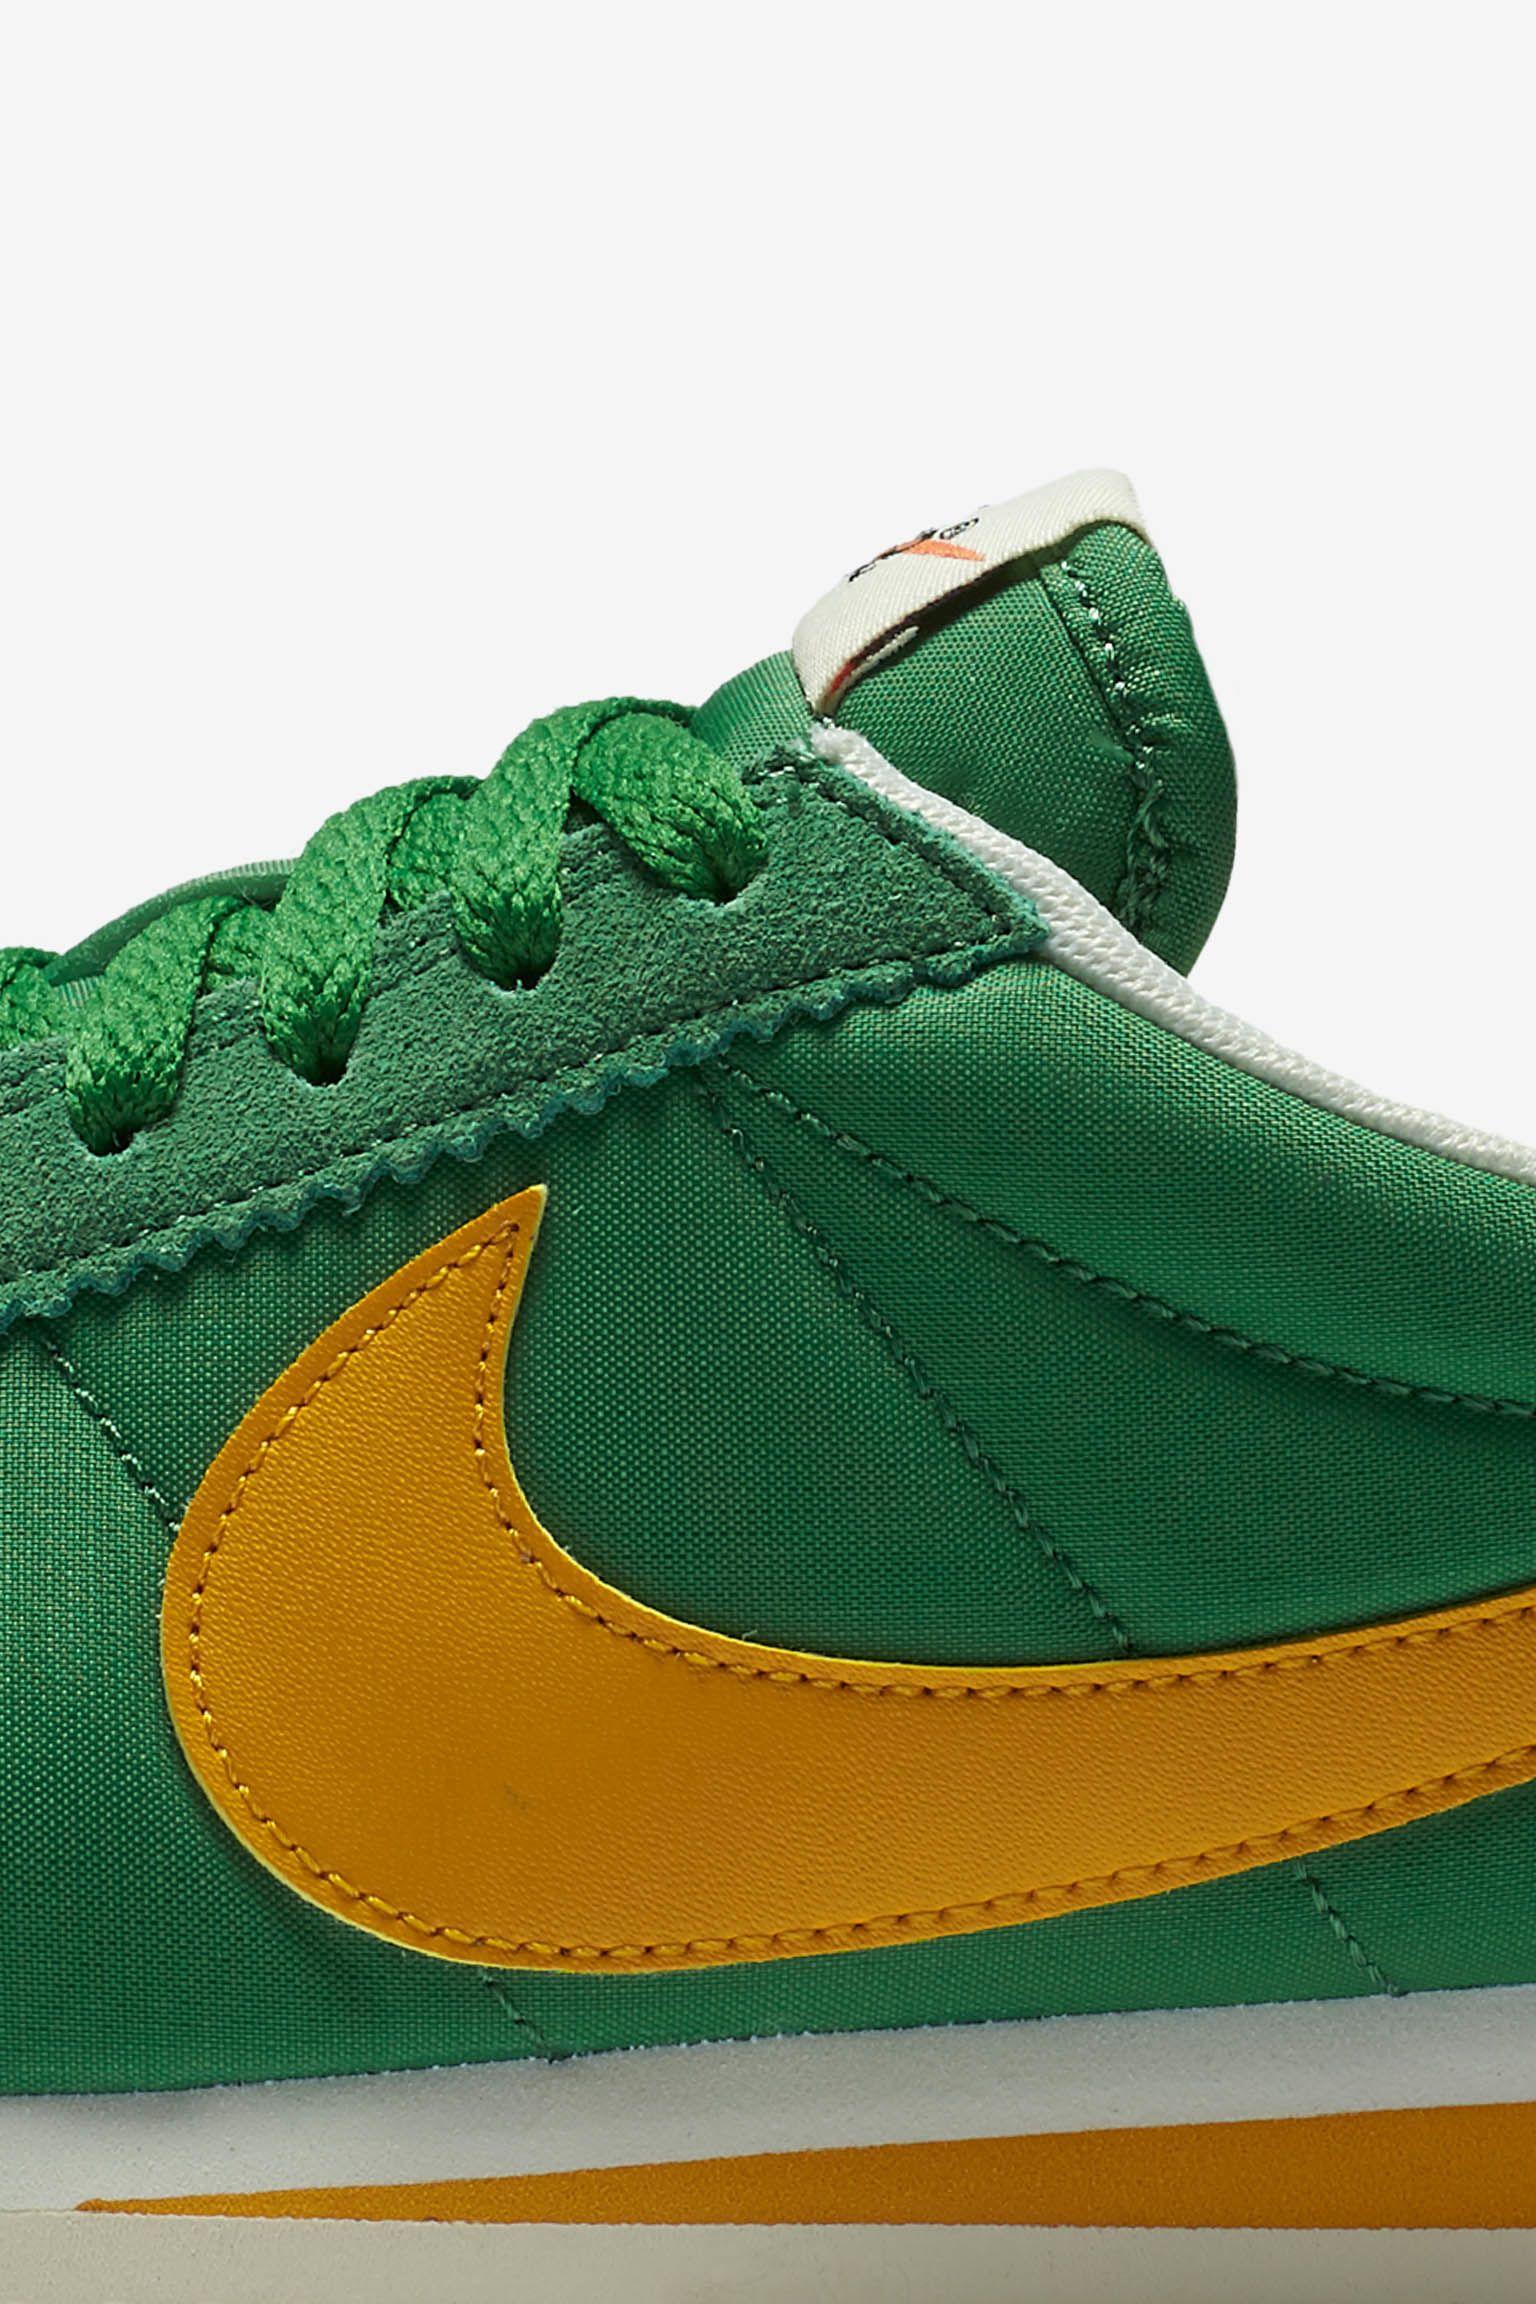 Women's Nike Classic Cortez Premium 'Classic Green & Yellow Ochre' Release Date